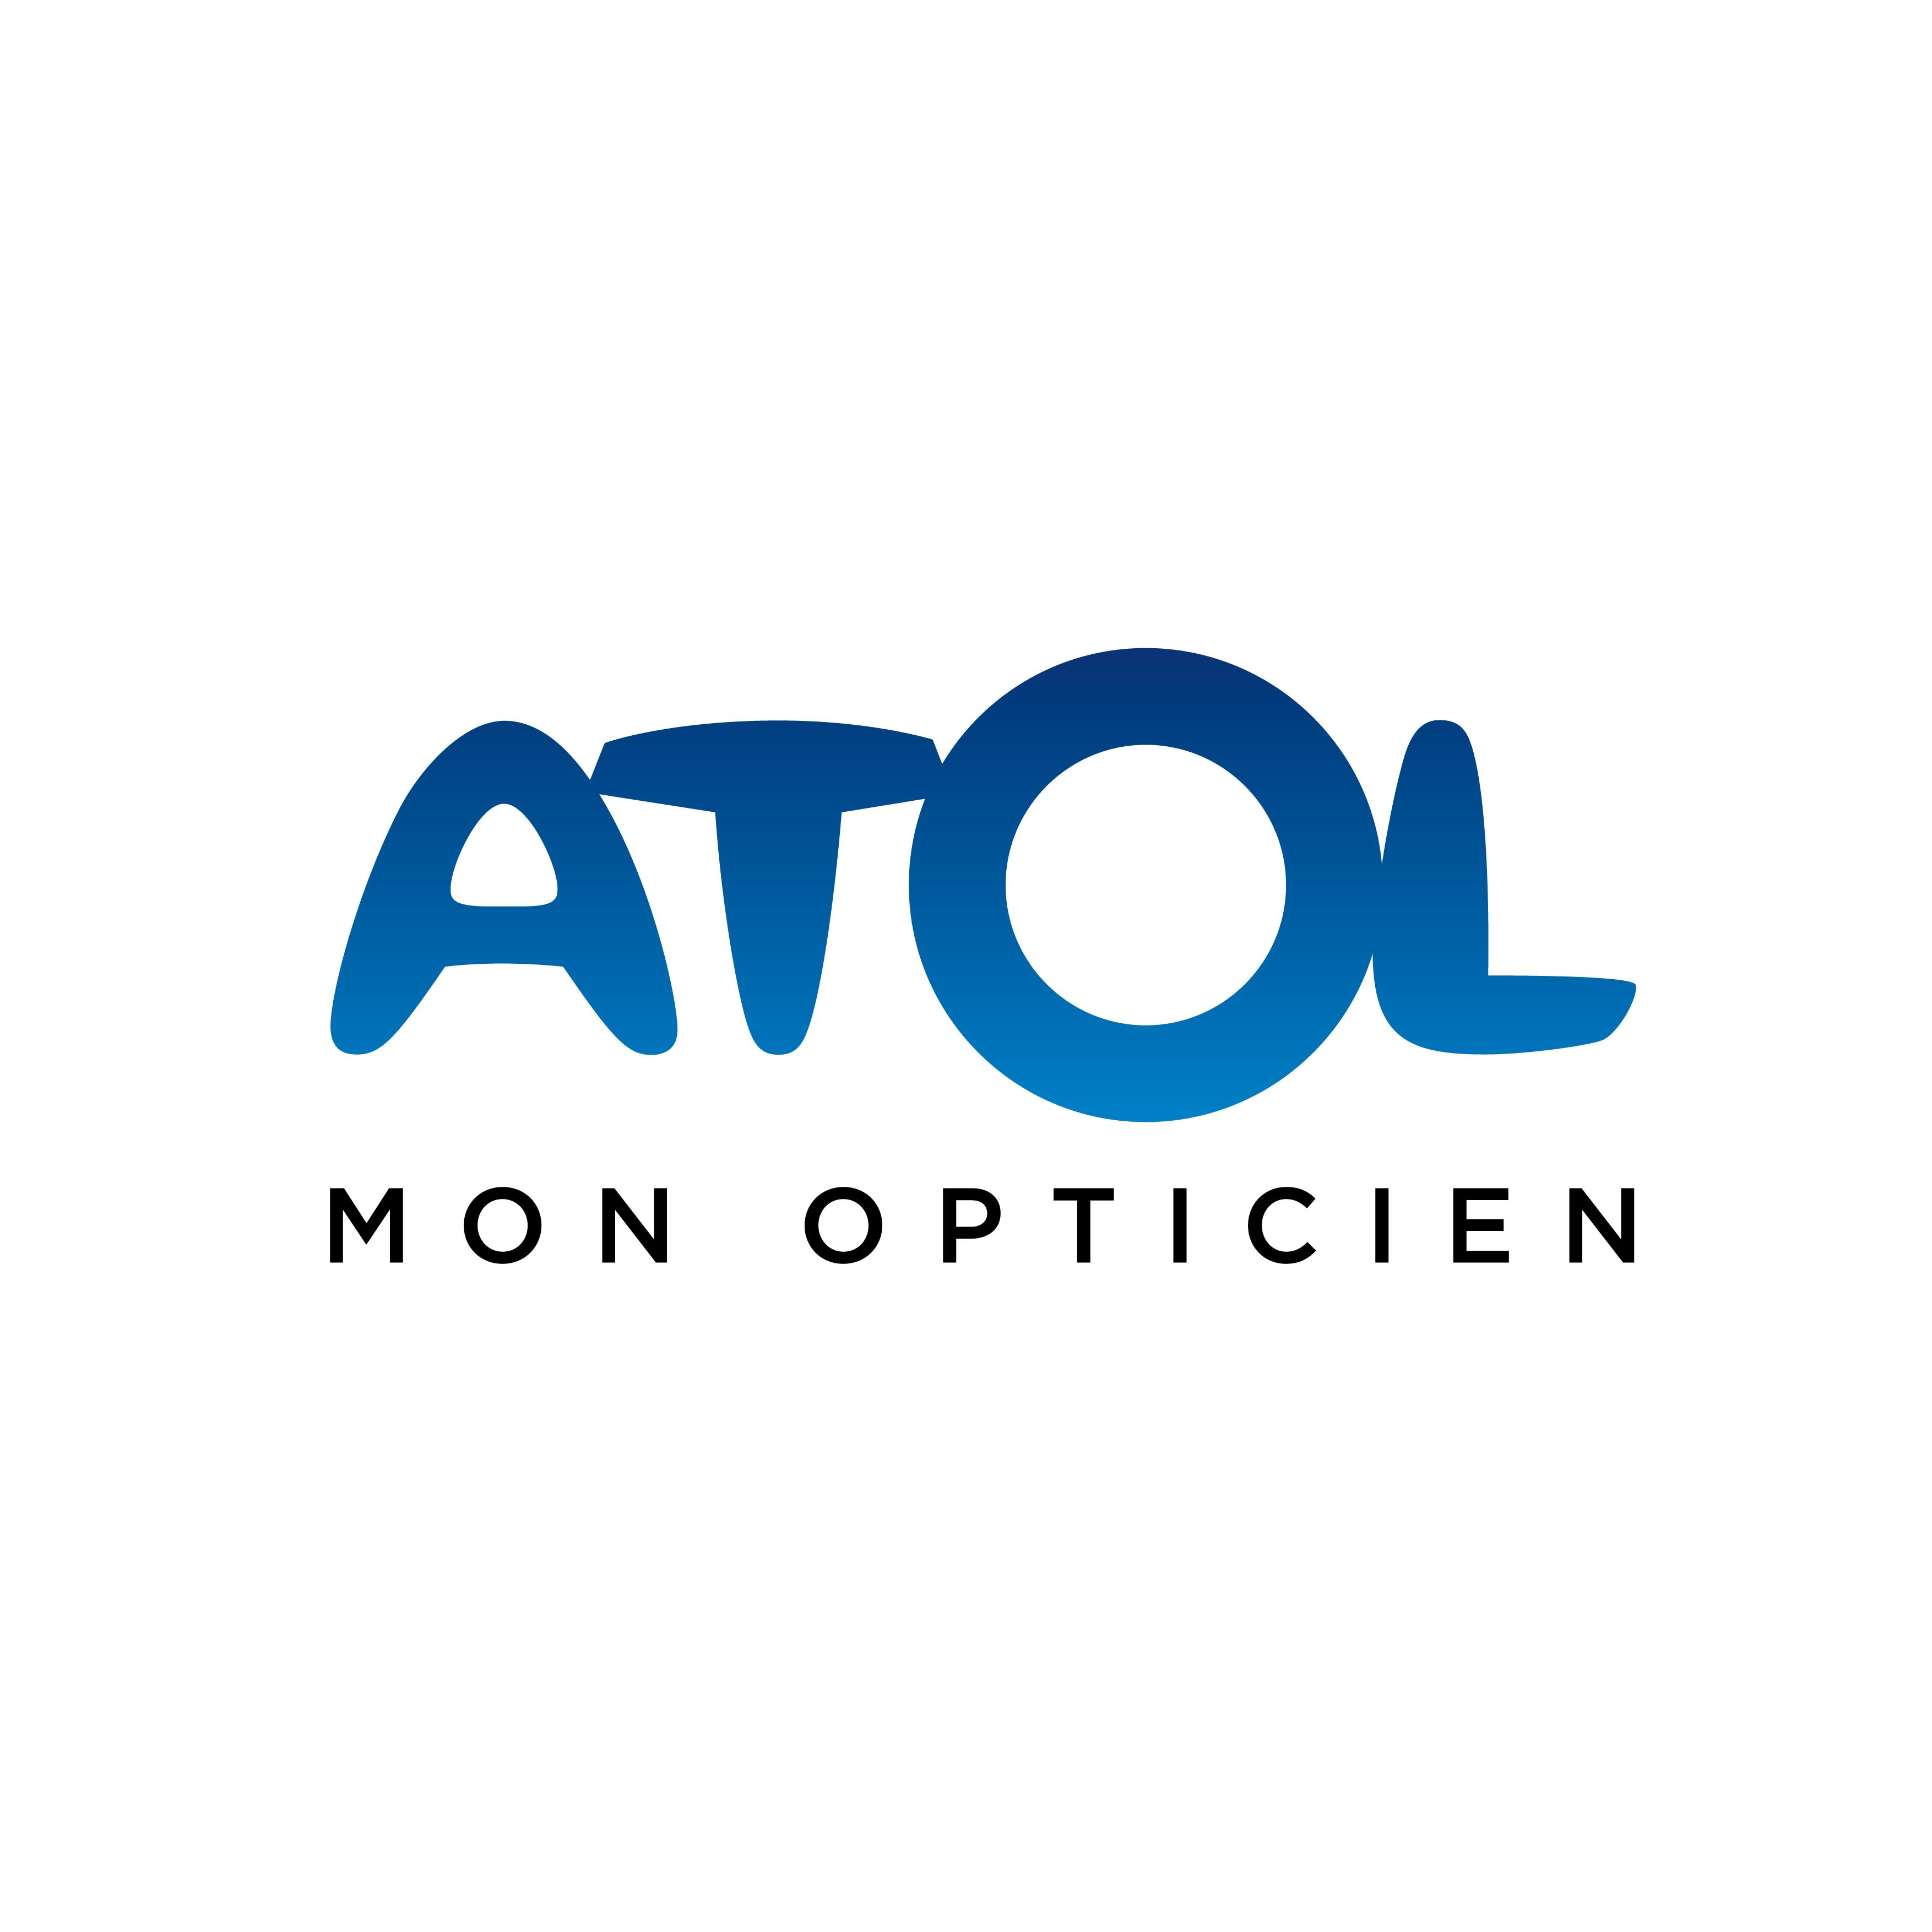 Atol Mon Opticien Melun